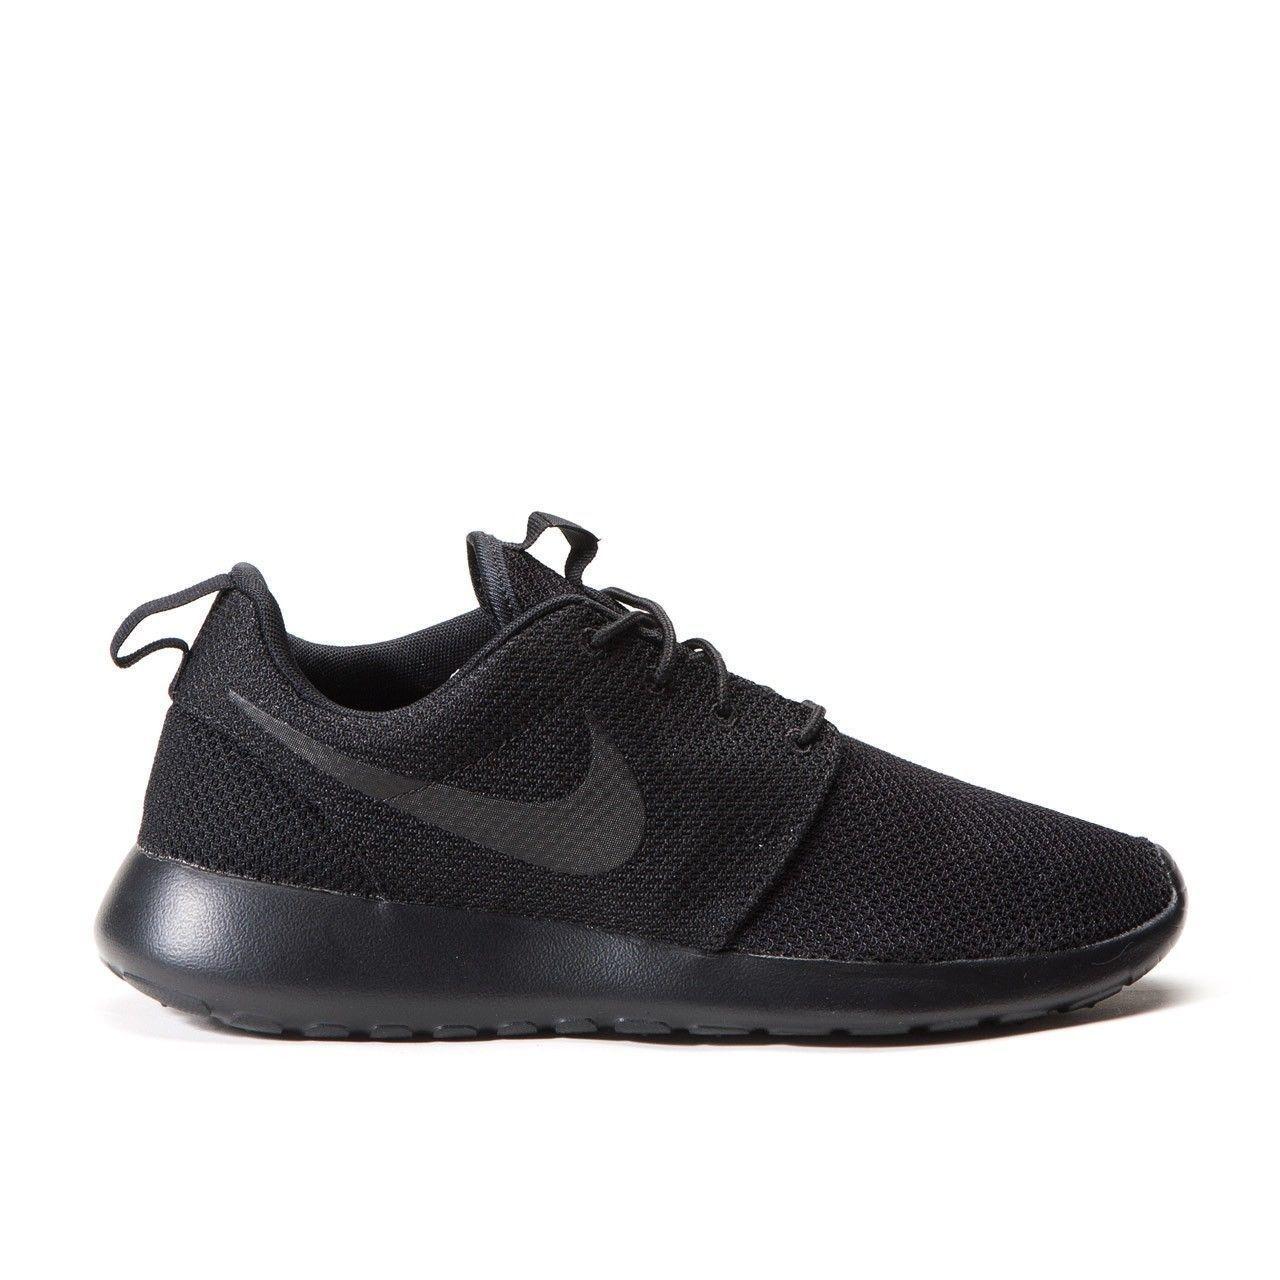 Nike Mens Rosherun Running Shoe Black/Black 511881-026